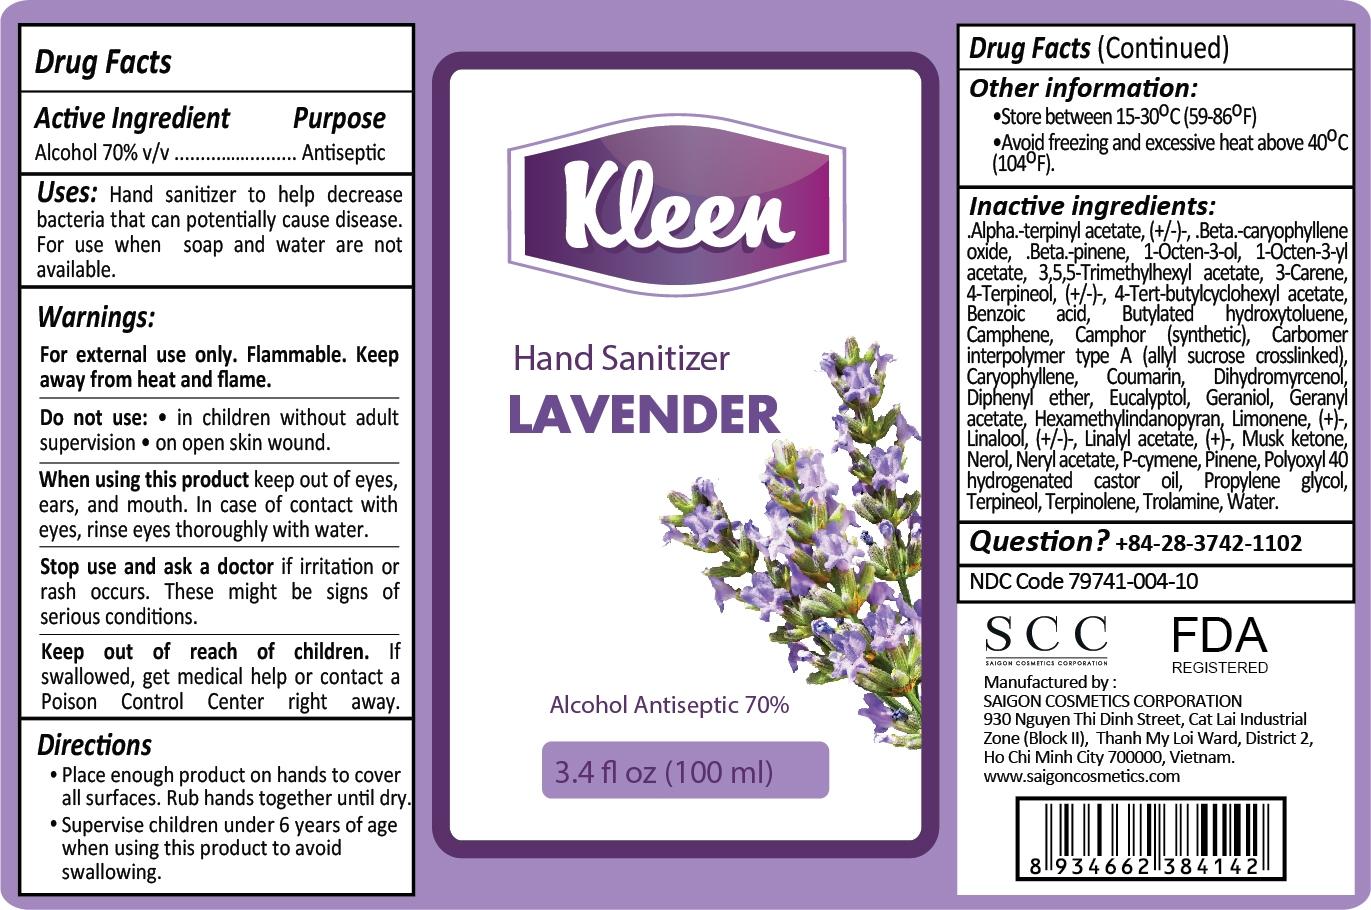 Kleen Hand Sanitizer Lavender 100ml Label